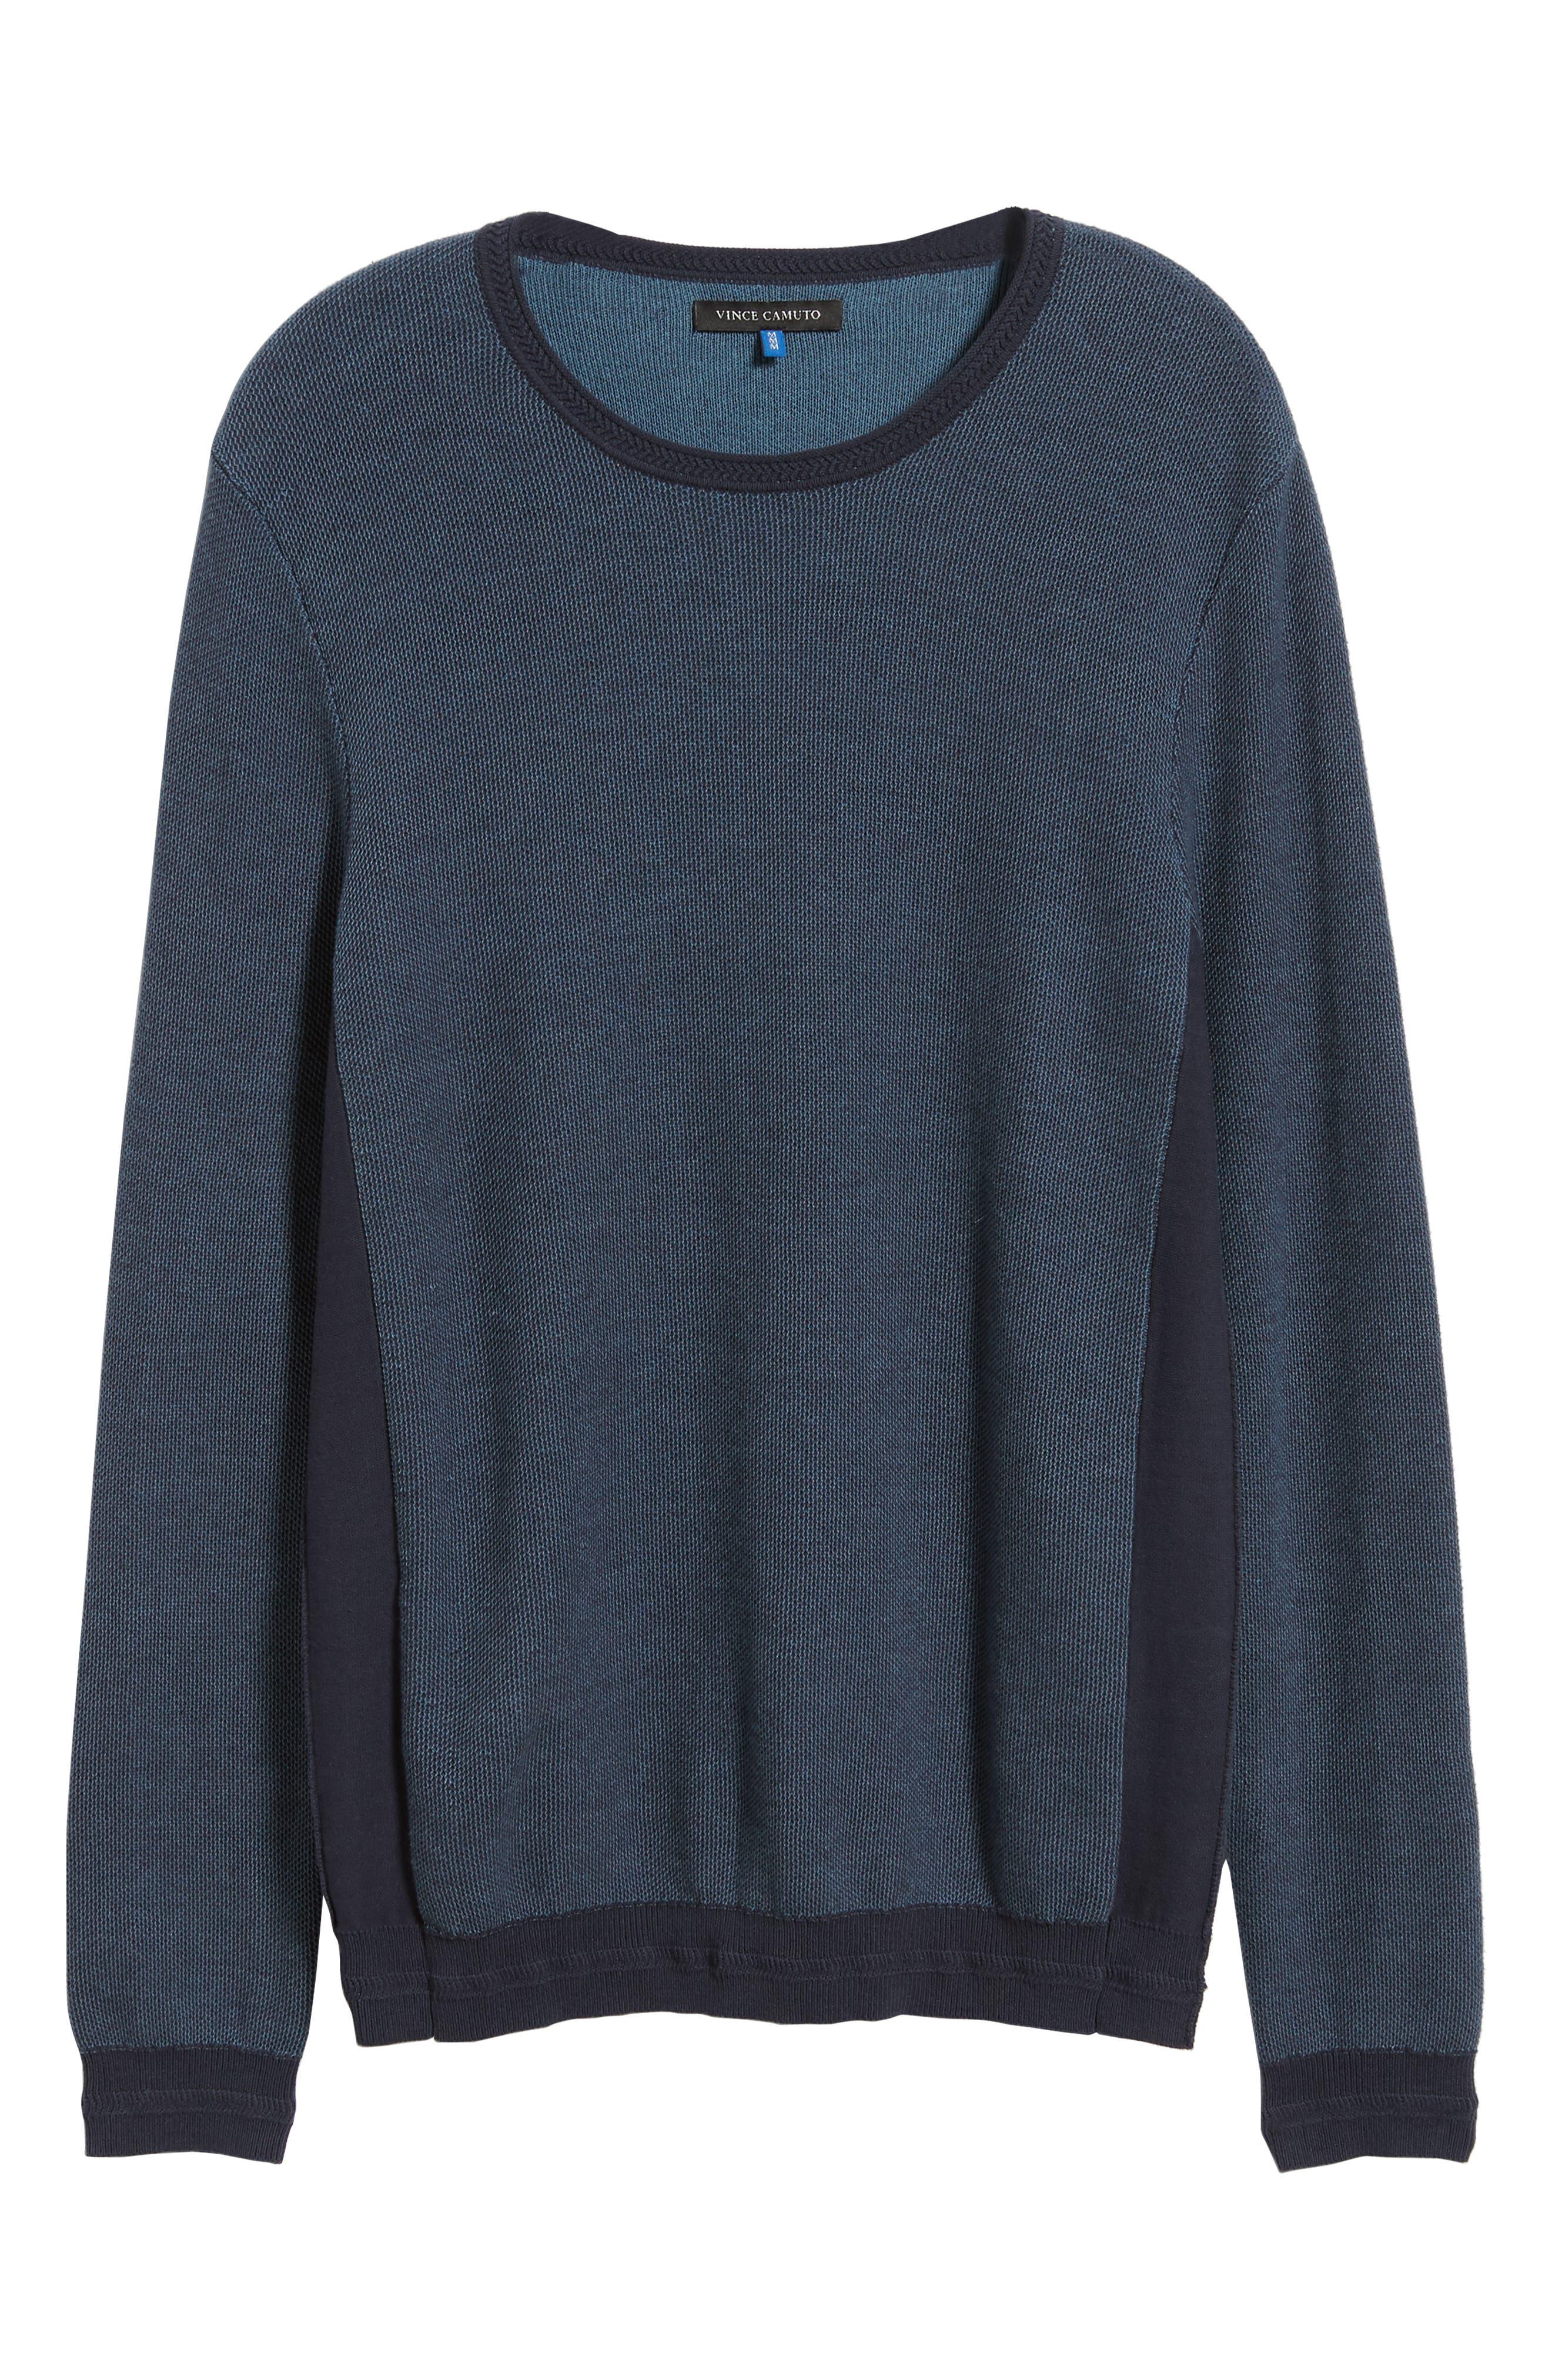 Space Dye Slim Fit Sweater,                             Alternate thumbnail 17, color,